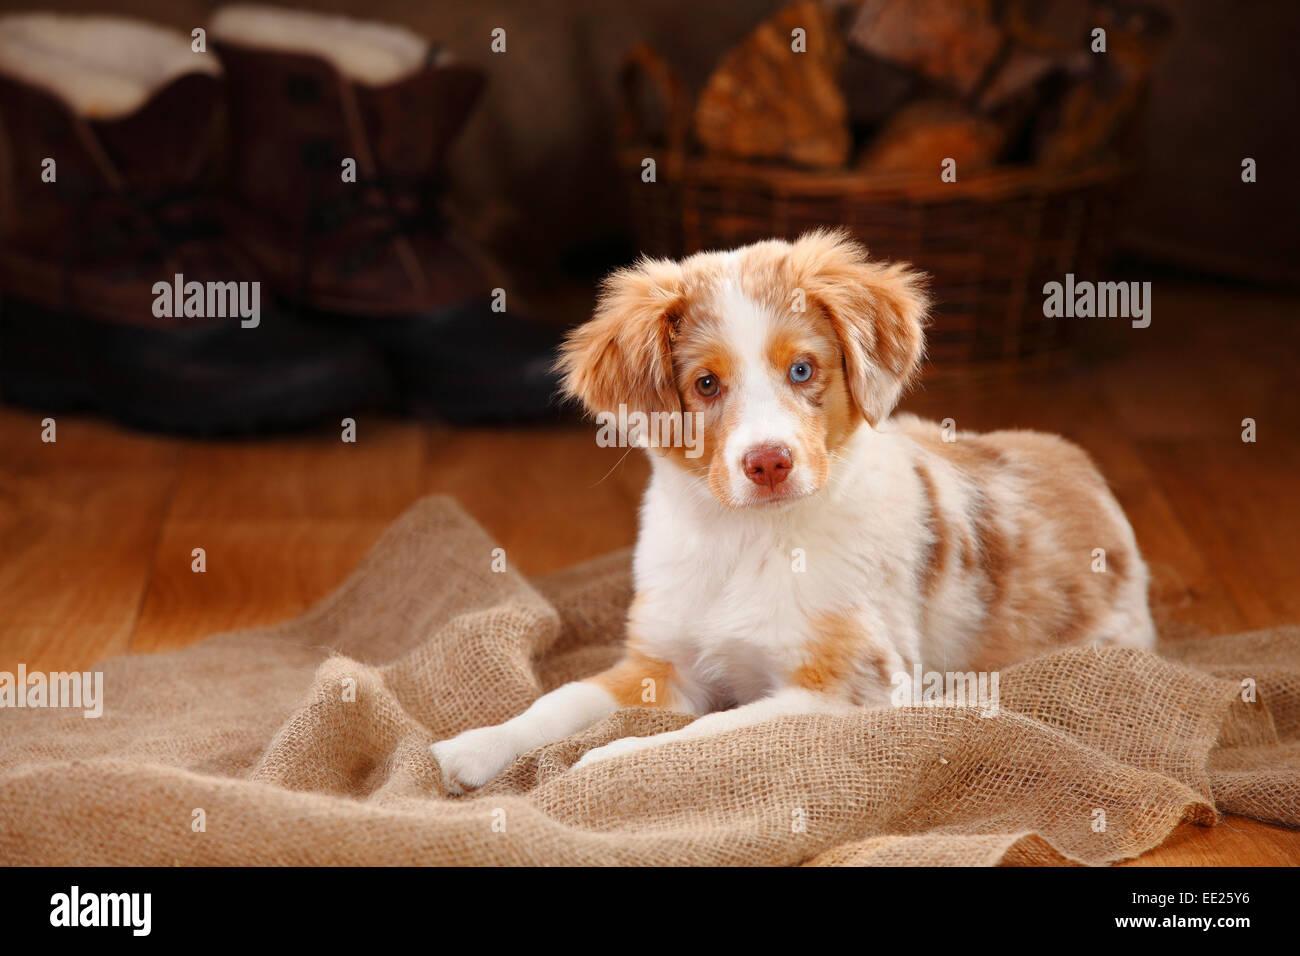 miniature australian shepherd puppy red merle 13 weeks stock photo royalty free image. Black Bedroom Furniture Sets. Home Design Ideas